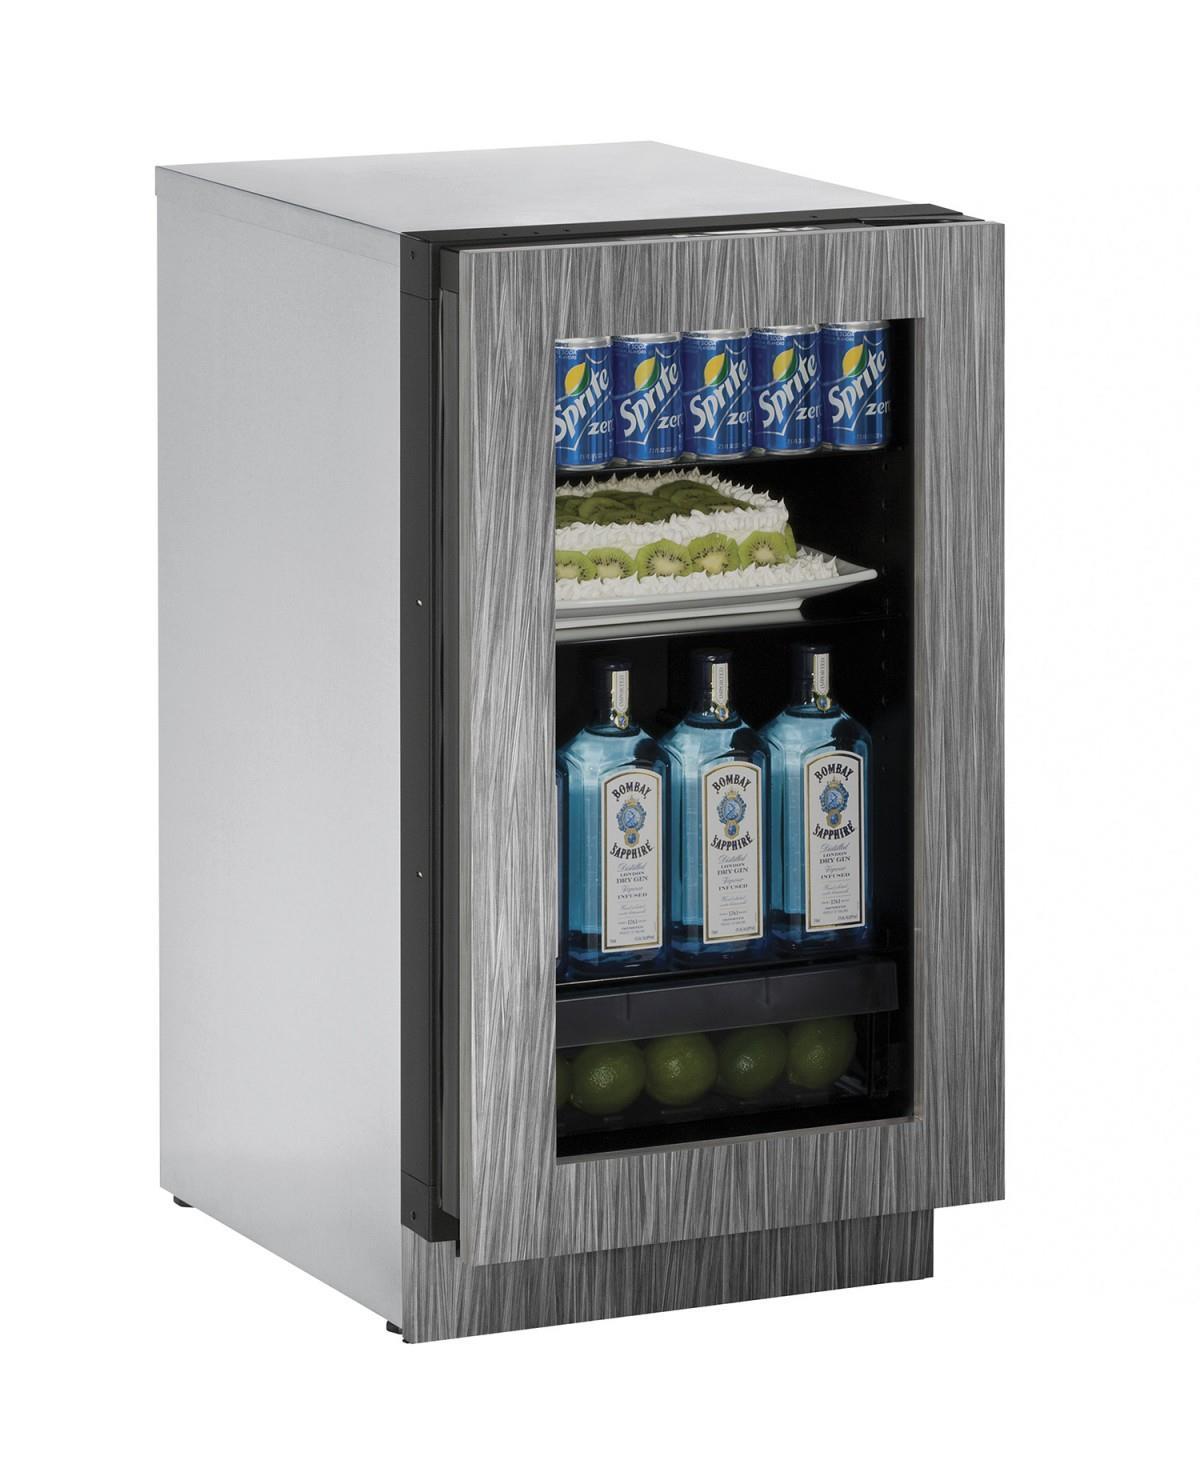 "U-Line Refrigerators 18"" Glass Door Compact Refrigerator - Item Number: U-3018RGLINT-00A"